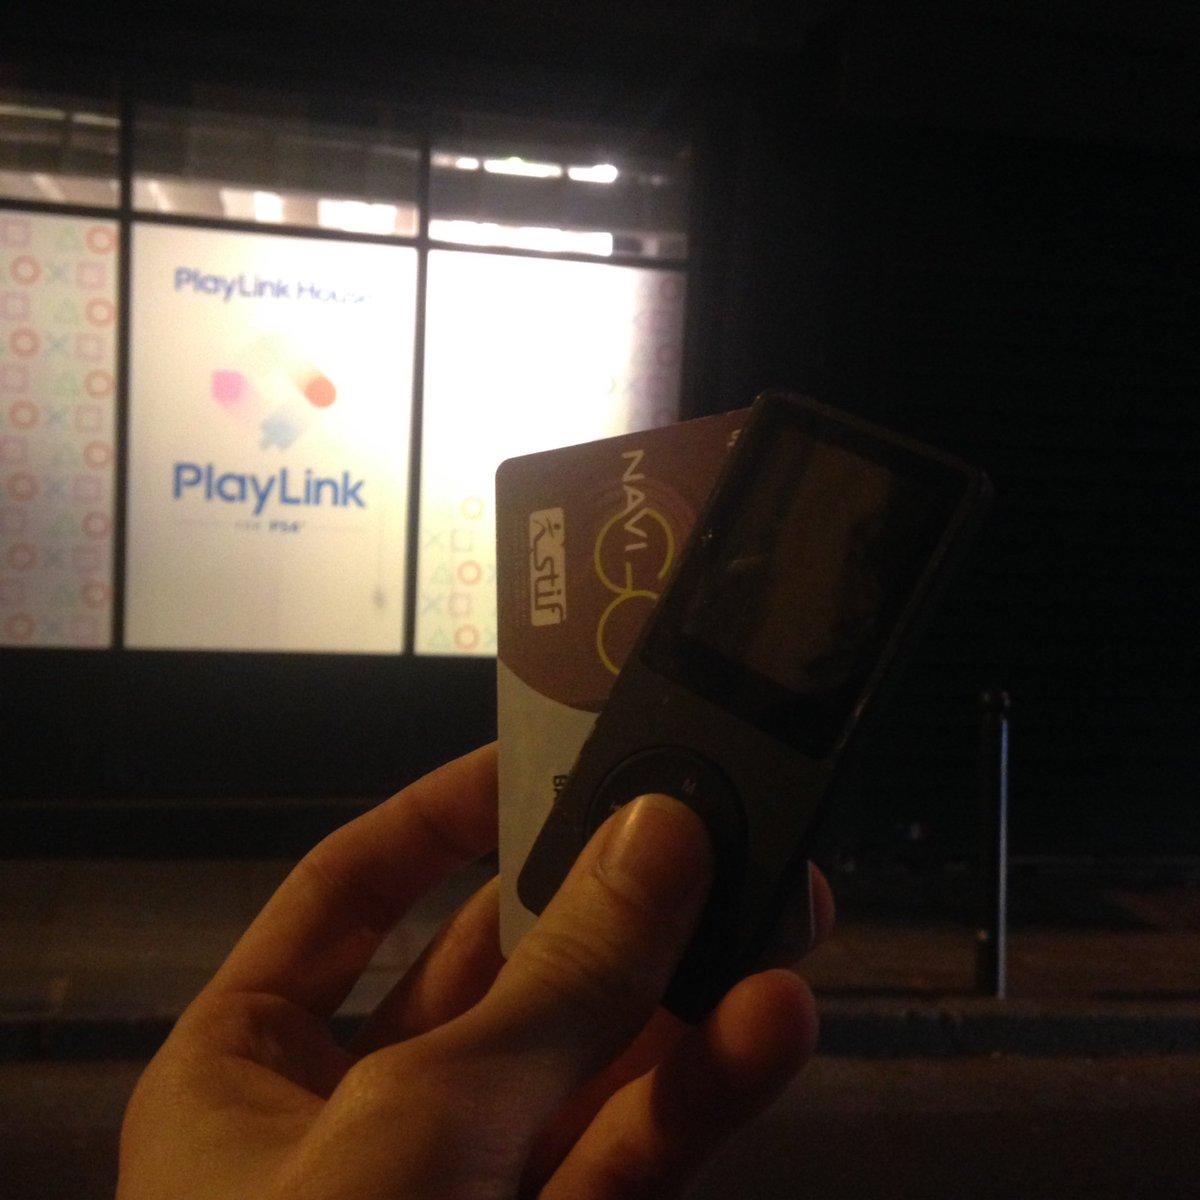 #PlayLinkHouse Latest News Trends Updates Images - MrZryx